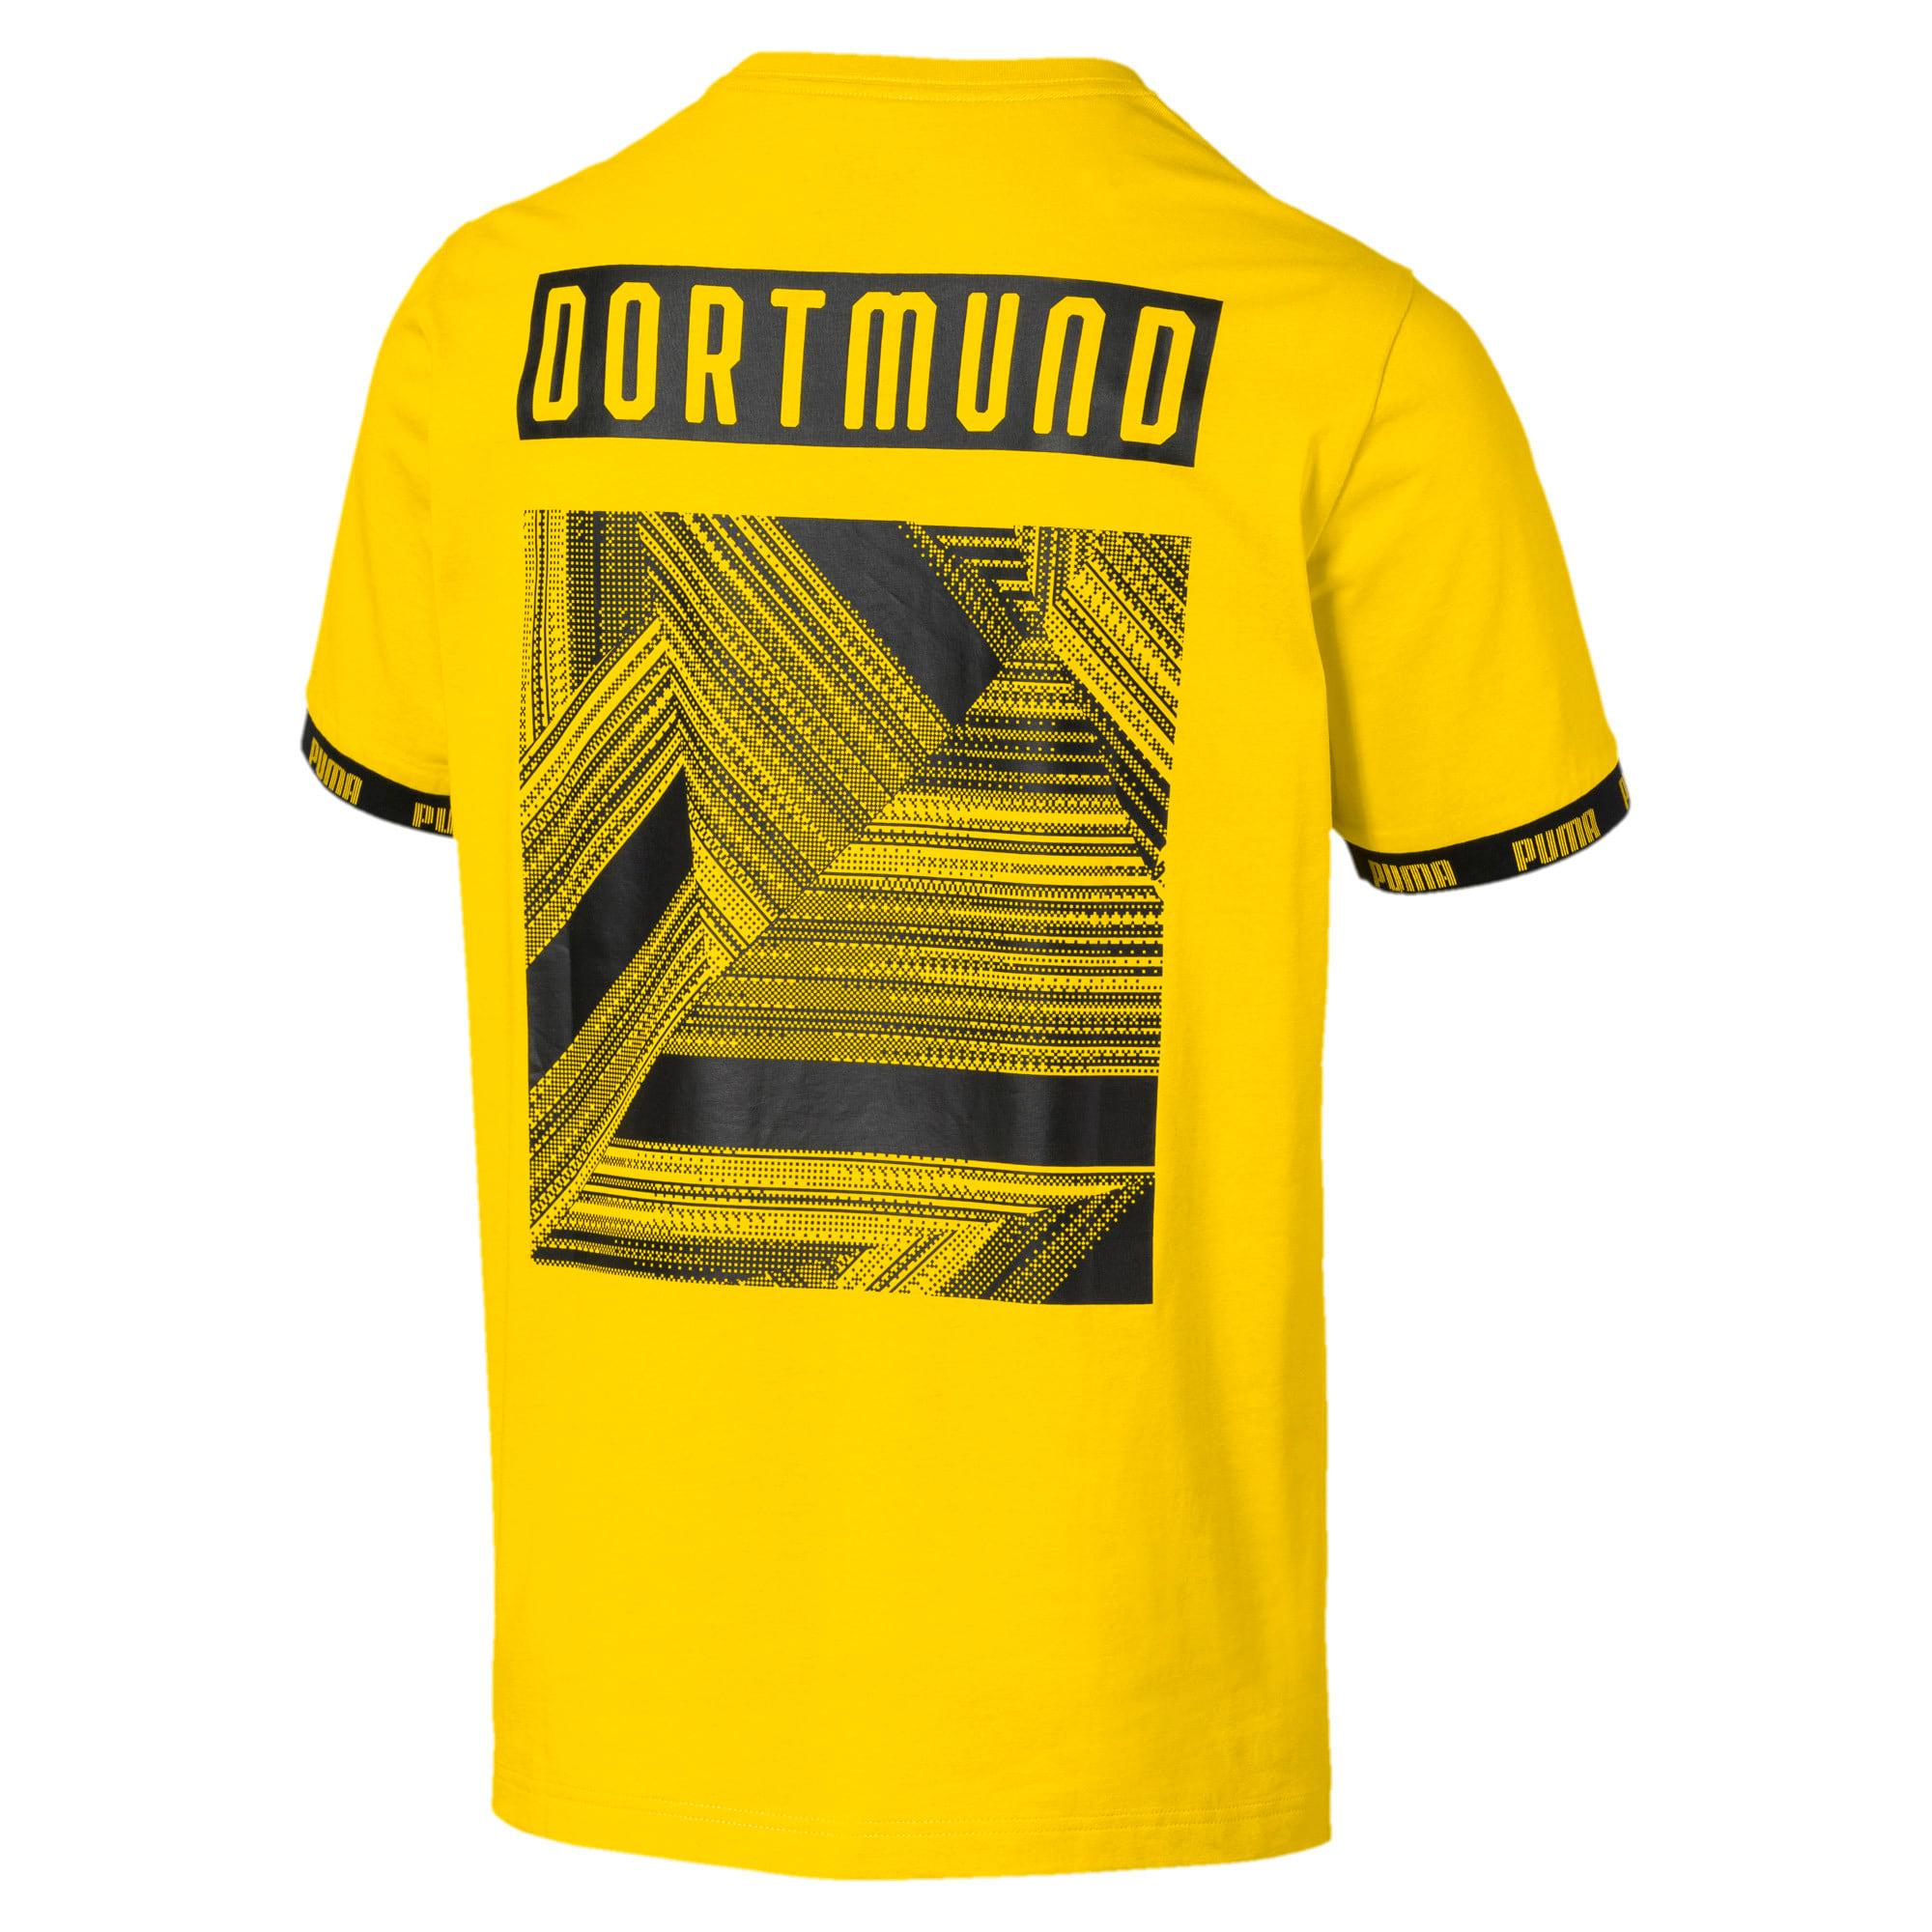 Thumbnail 5 of BVB Football Culture Men's Tee, Cyber Yellow, medium